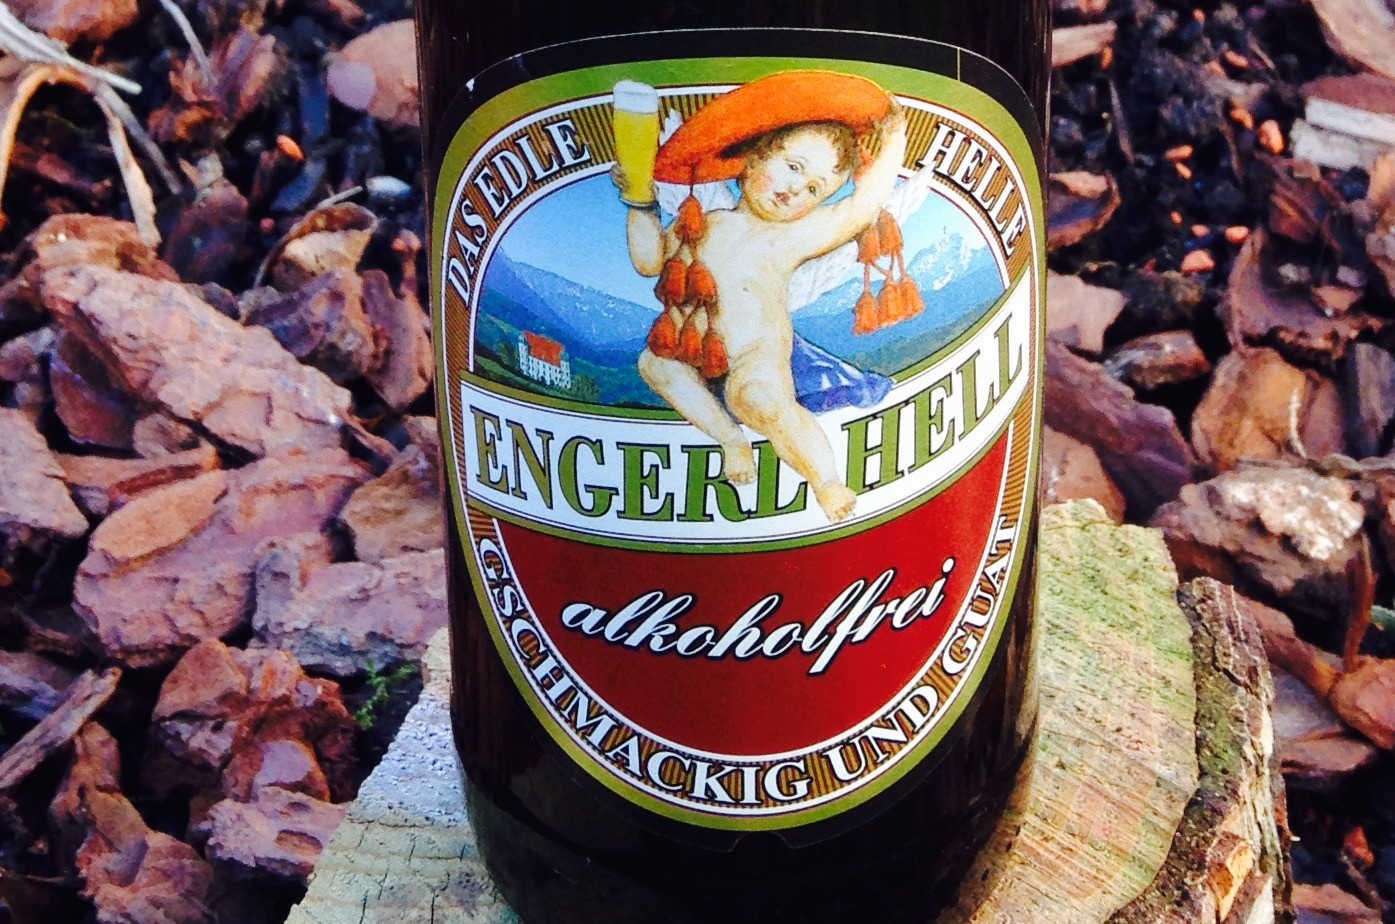 Engerl Helles - non Alkohol